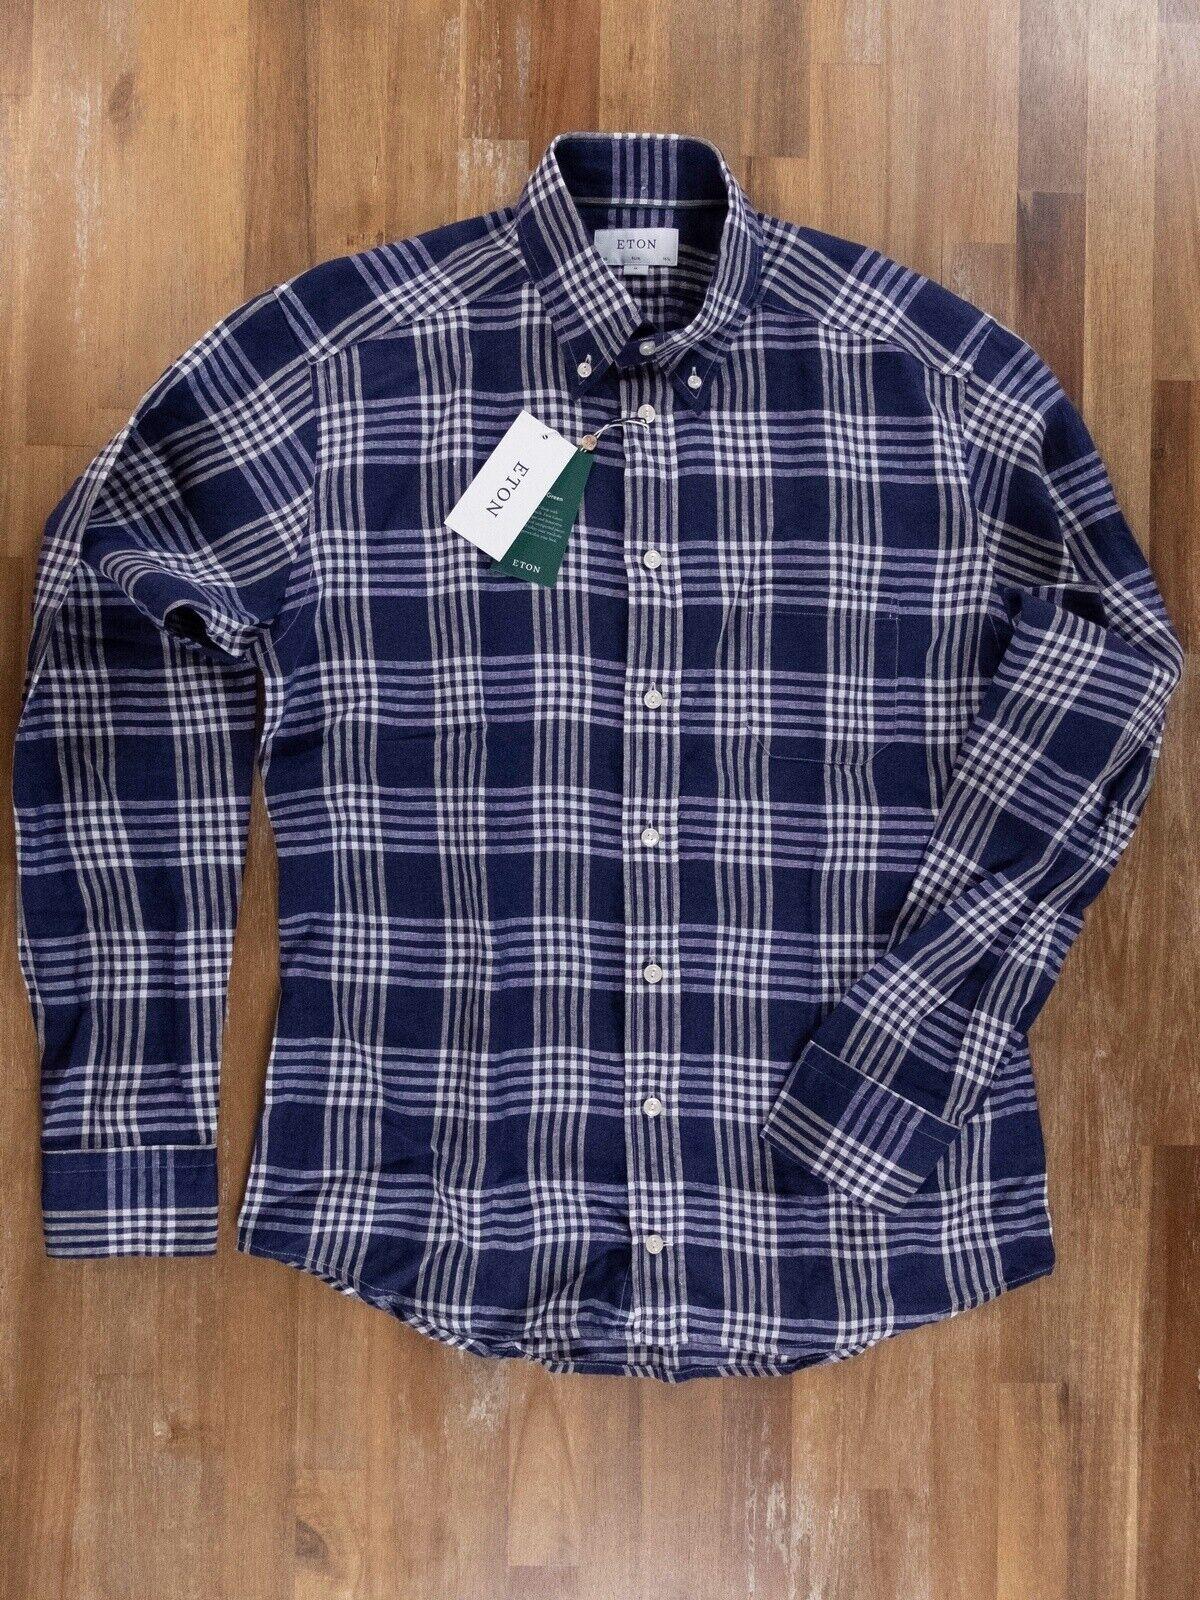 ETON of Sweden slim-fit plaid Blau linen Hemd authentic - Größe 40   15.75 - NWT